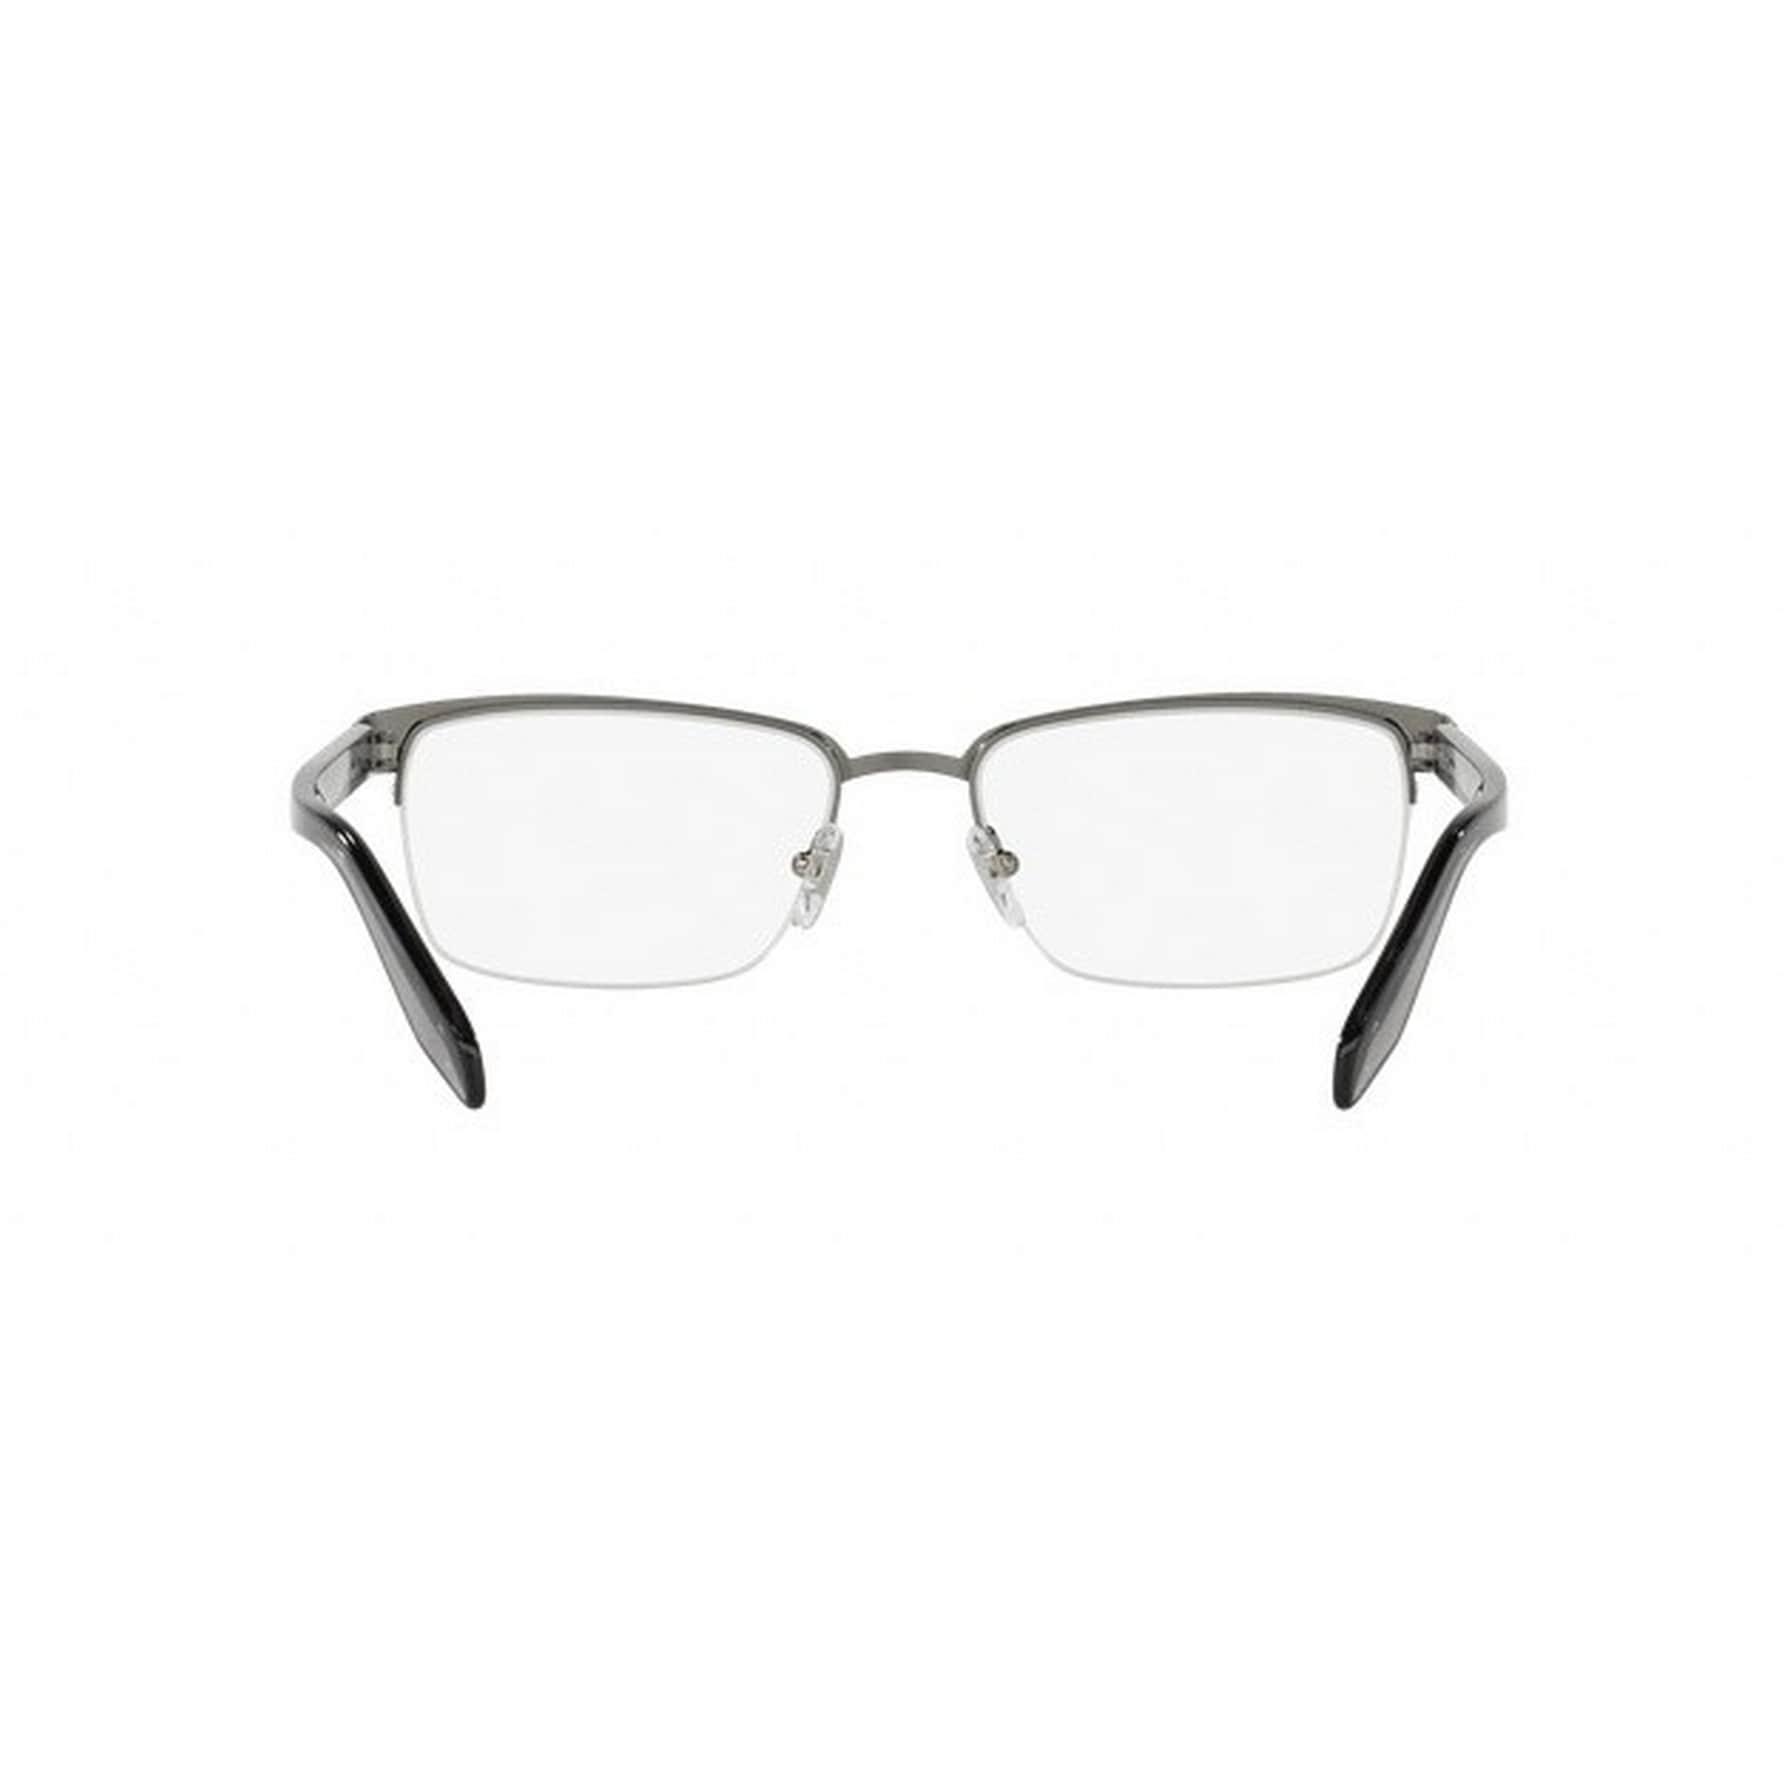 dfdd4c5eb6e Shop Versace Men s VE1241 1264 54 Rectangle Metal Plastic Gunmetal Clear  Eyeglasses - Free Shipping Today - Overstock.com - 14779976